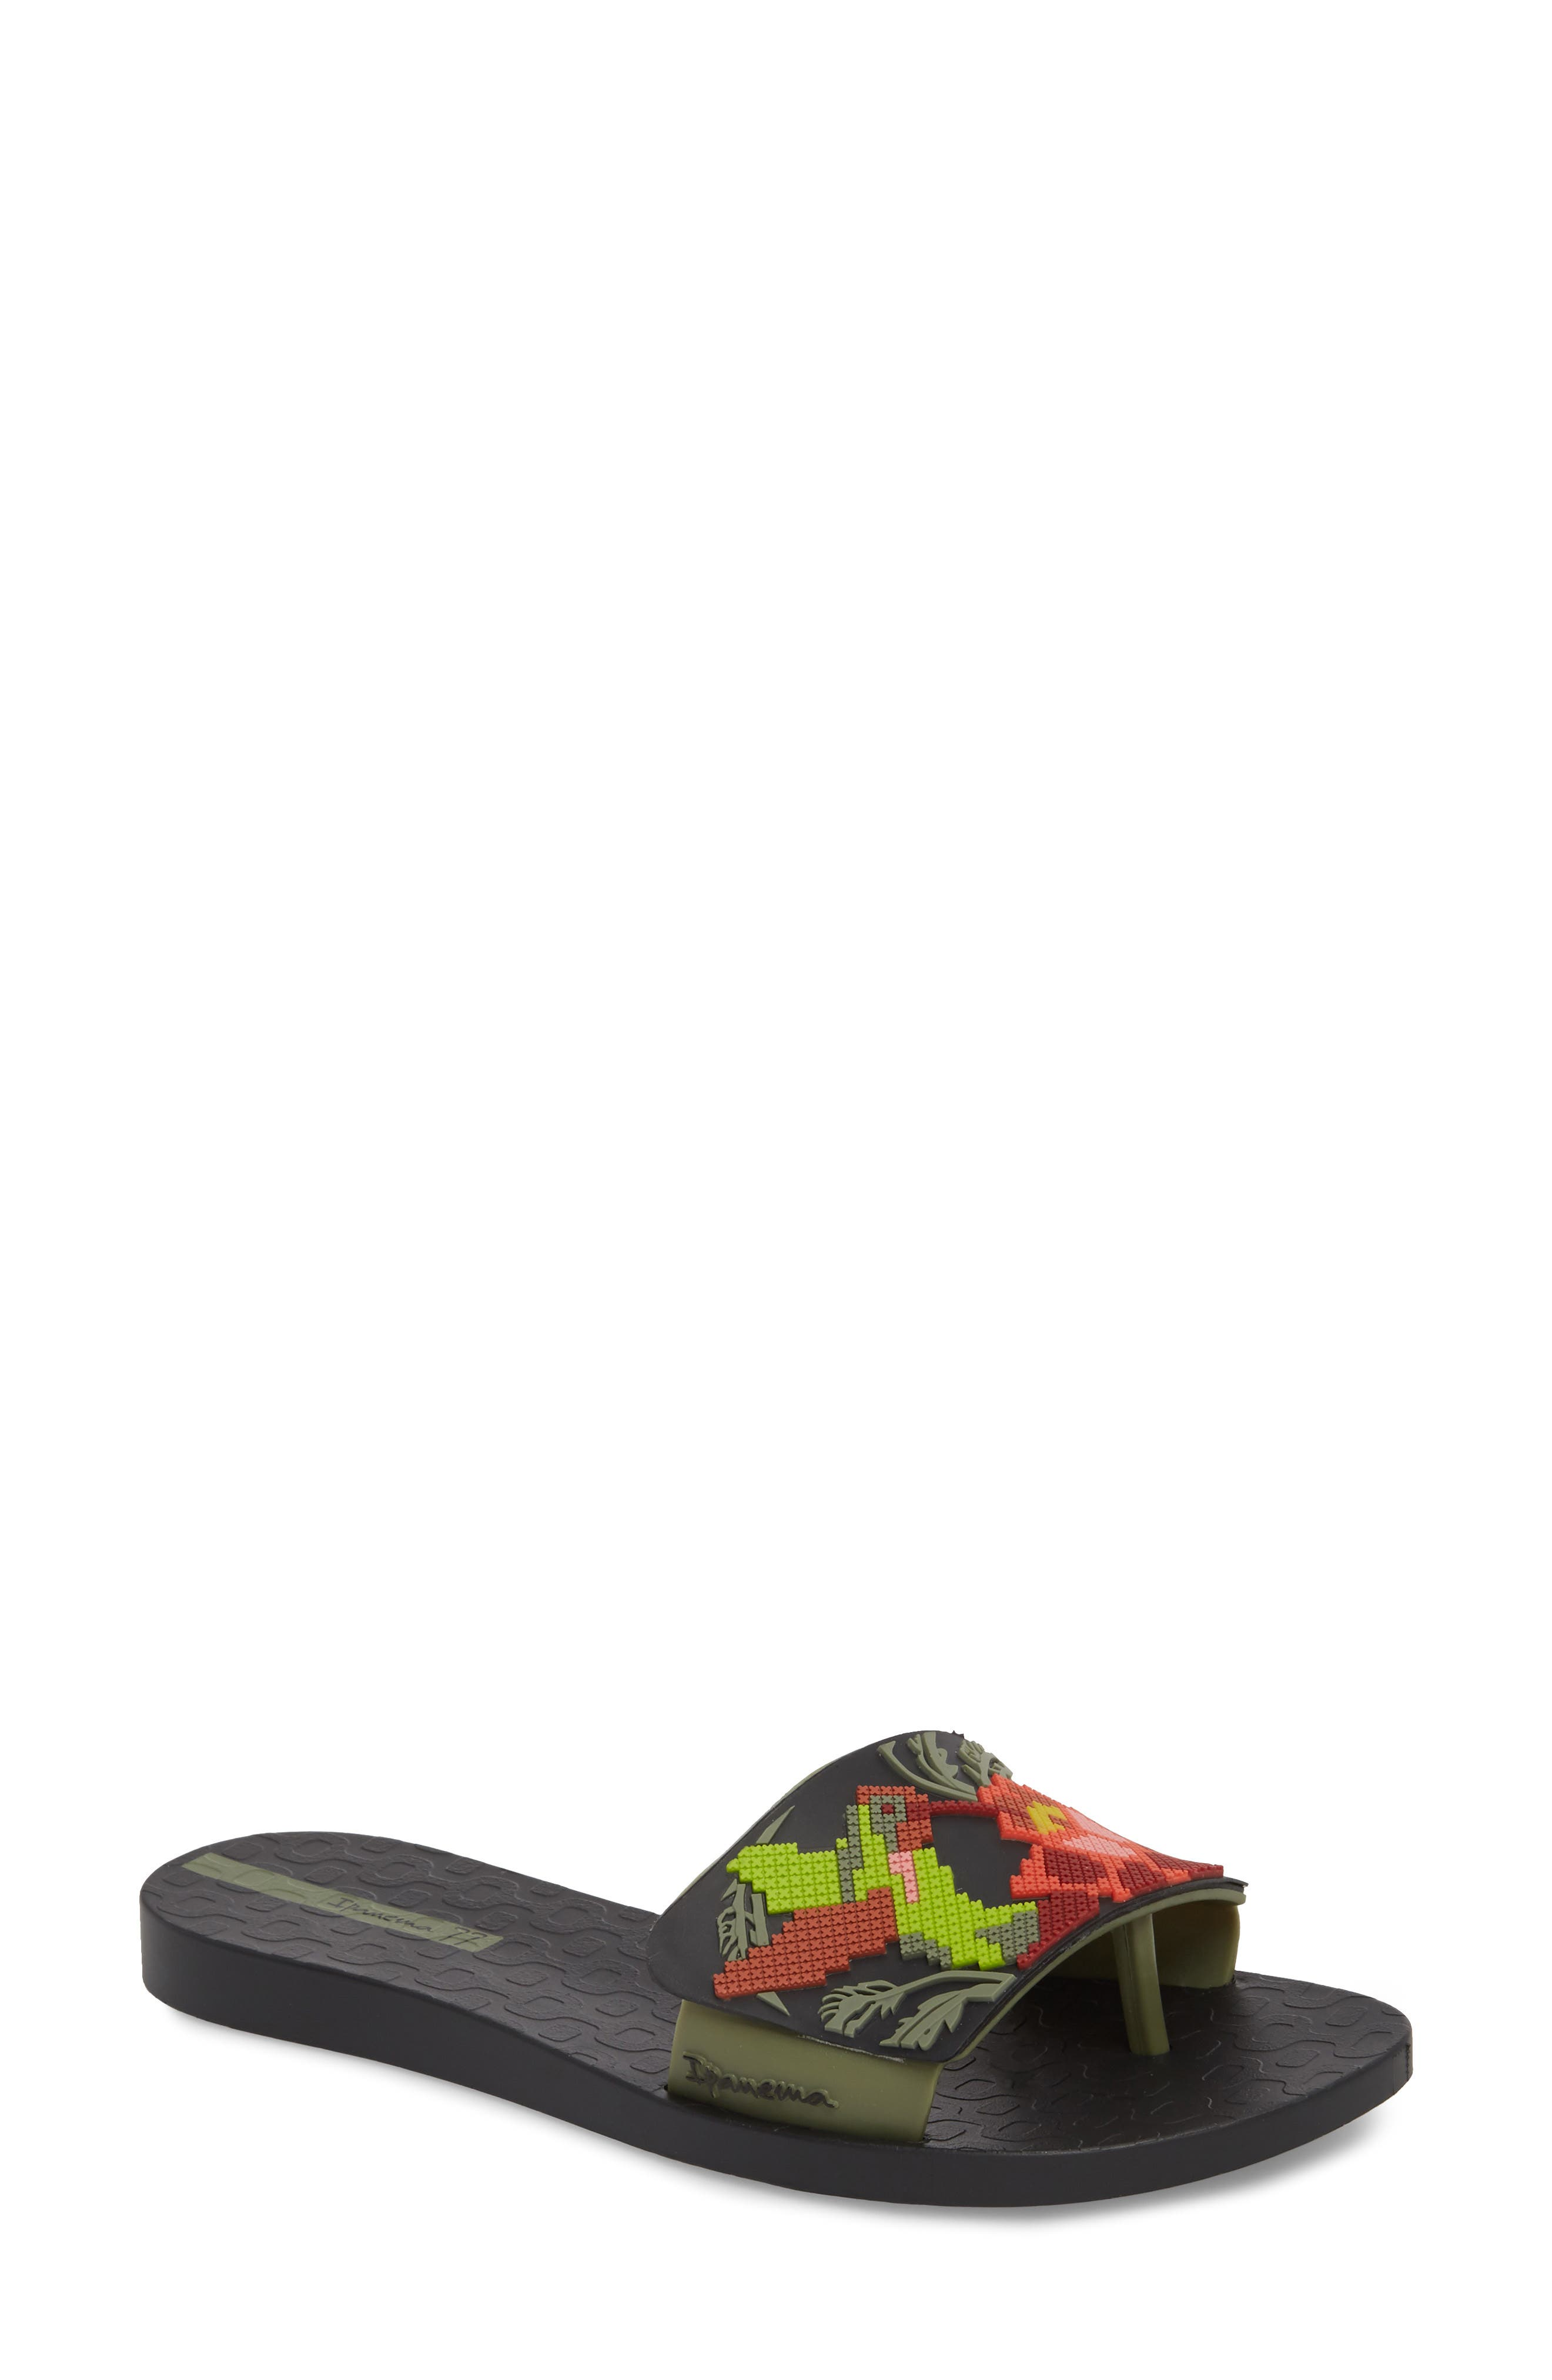 IPANEMA, Nectar Floral Slide Sandal, Main thumbnail 1, color, BLACK/ GREEN